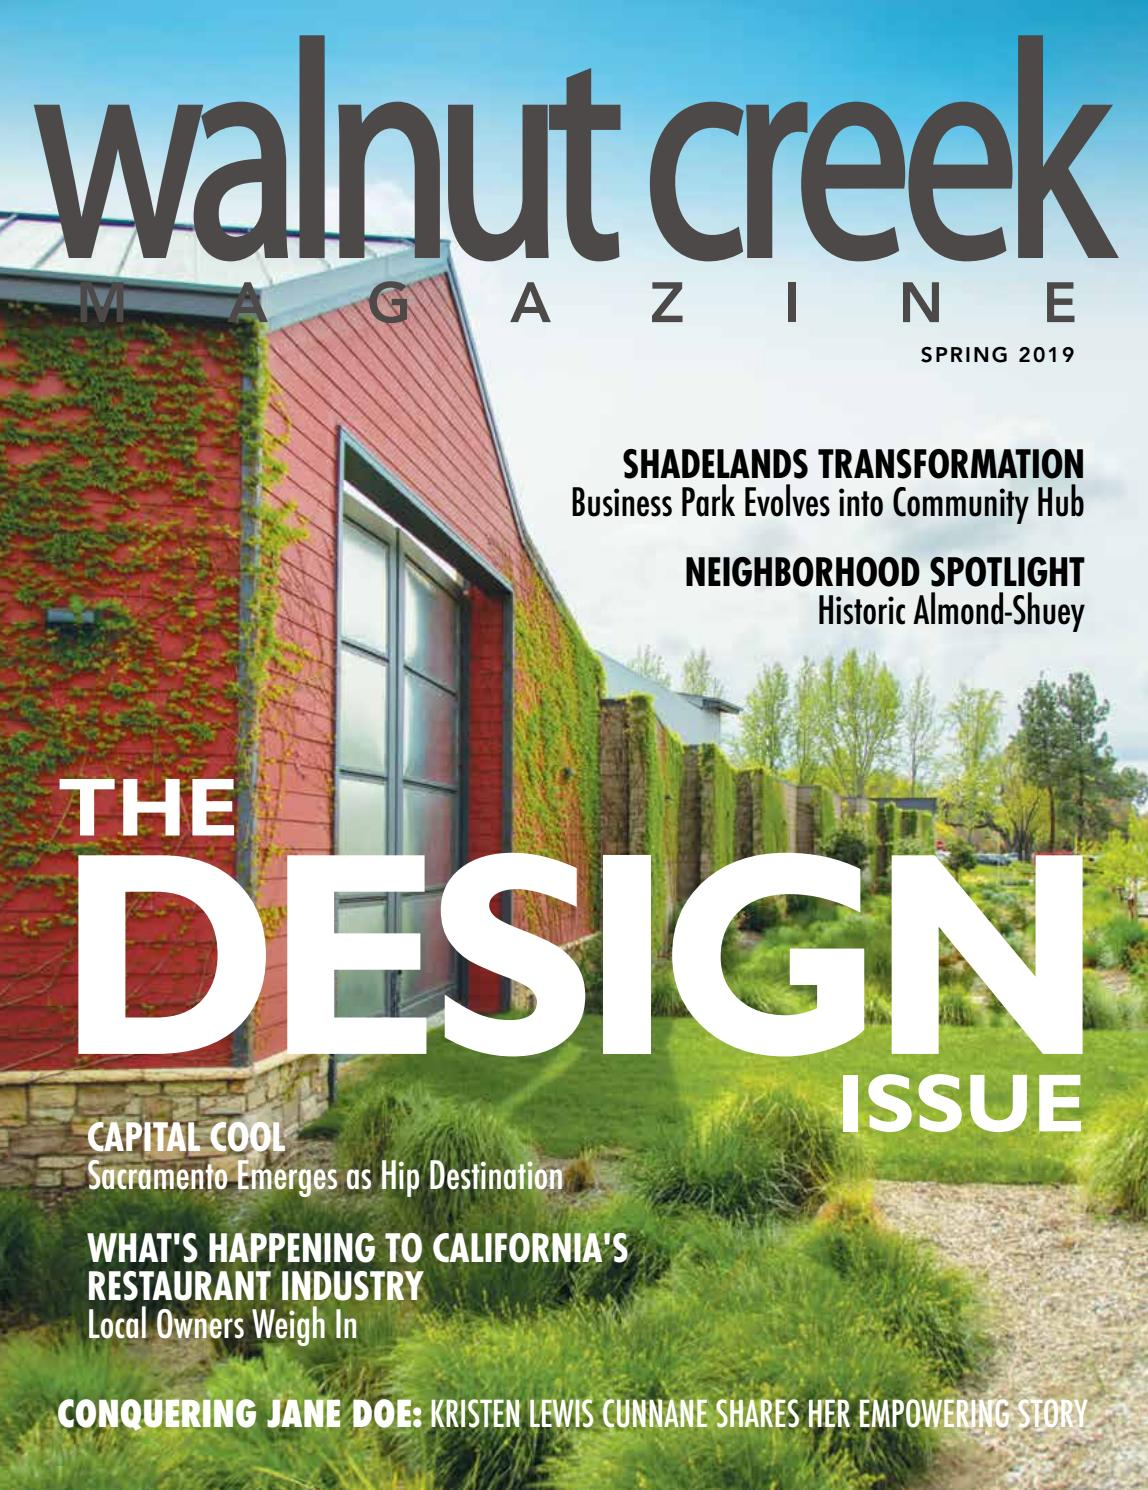 Transformation Palette En Jardiniere walnut creek magazine spring 2019walnut creek magazine